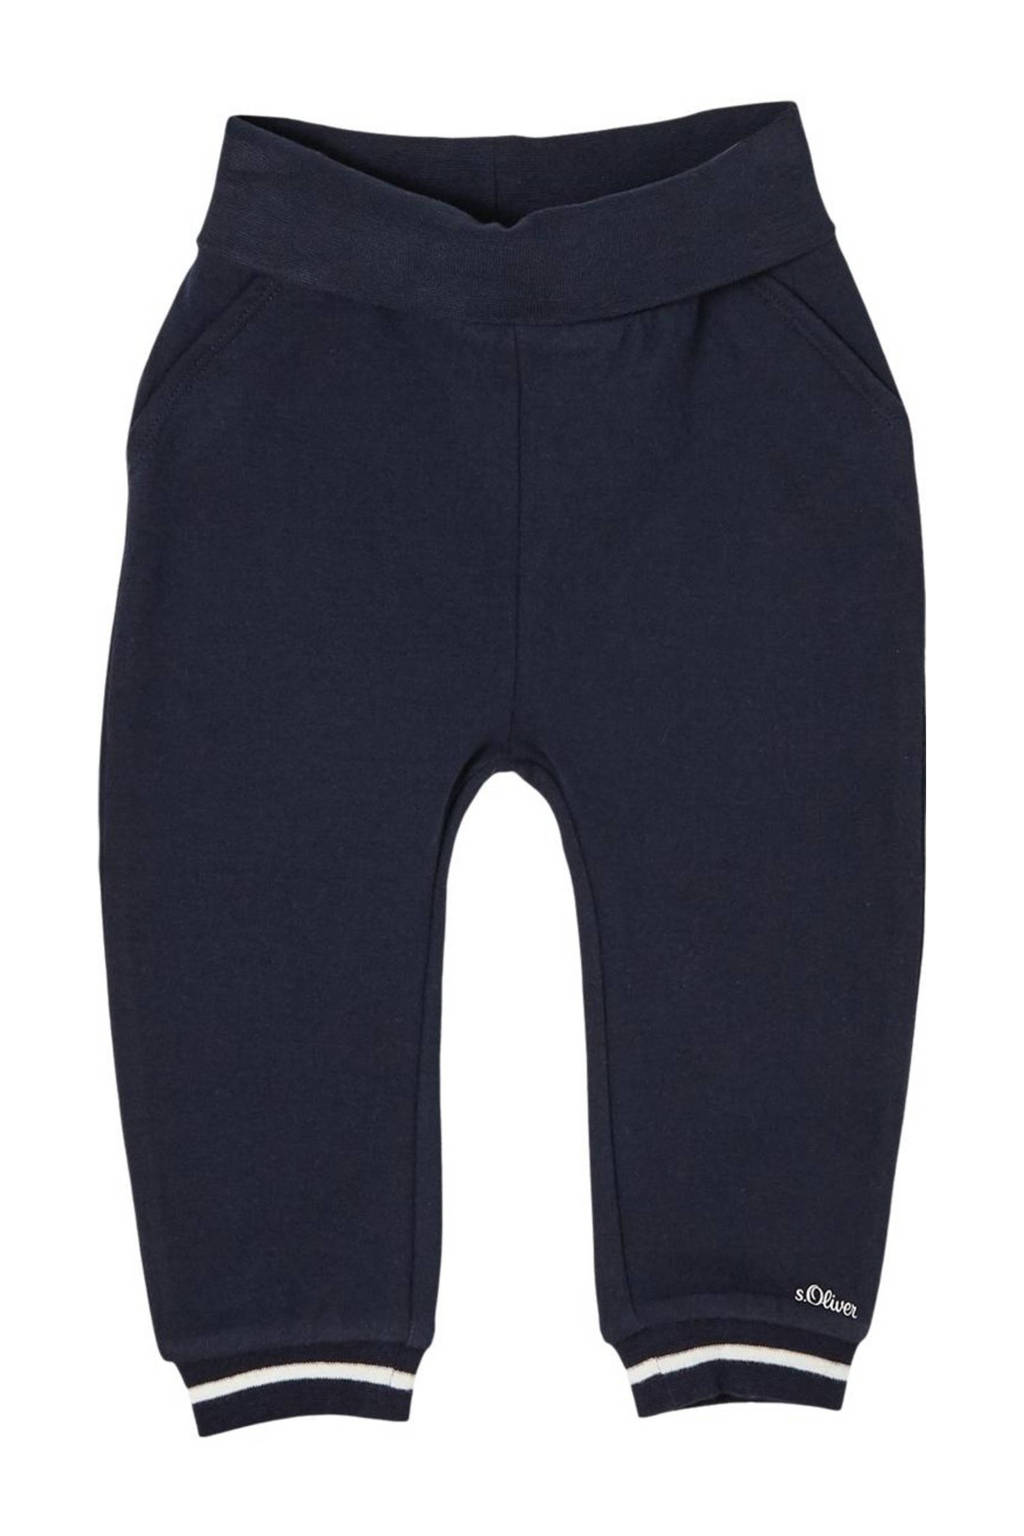 s.Oliver baby gemêleerde regular fit joggingbroek donkerblauw/wit, Donkerblauw/wit